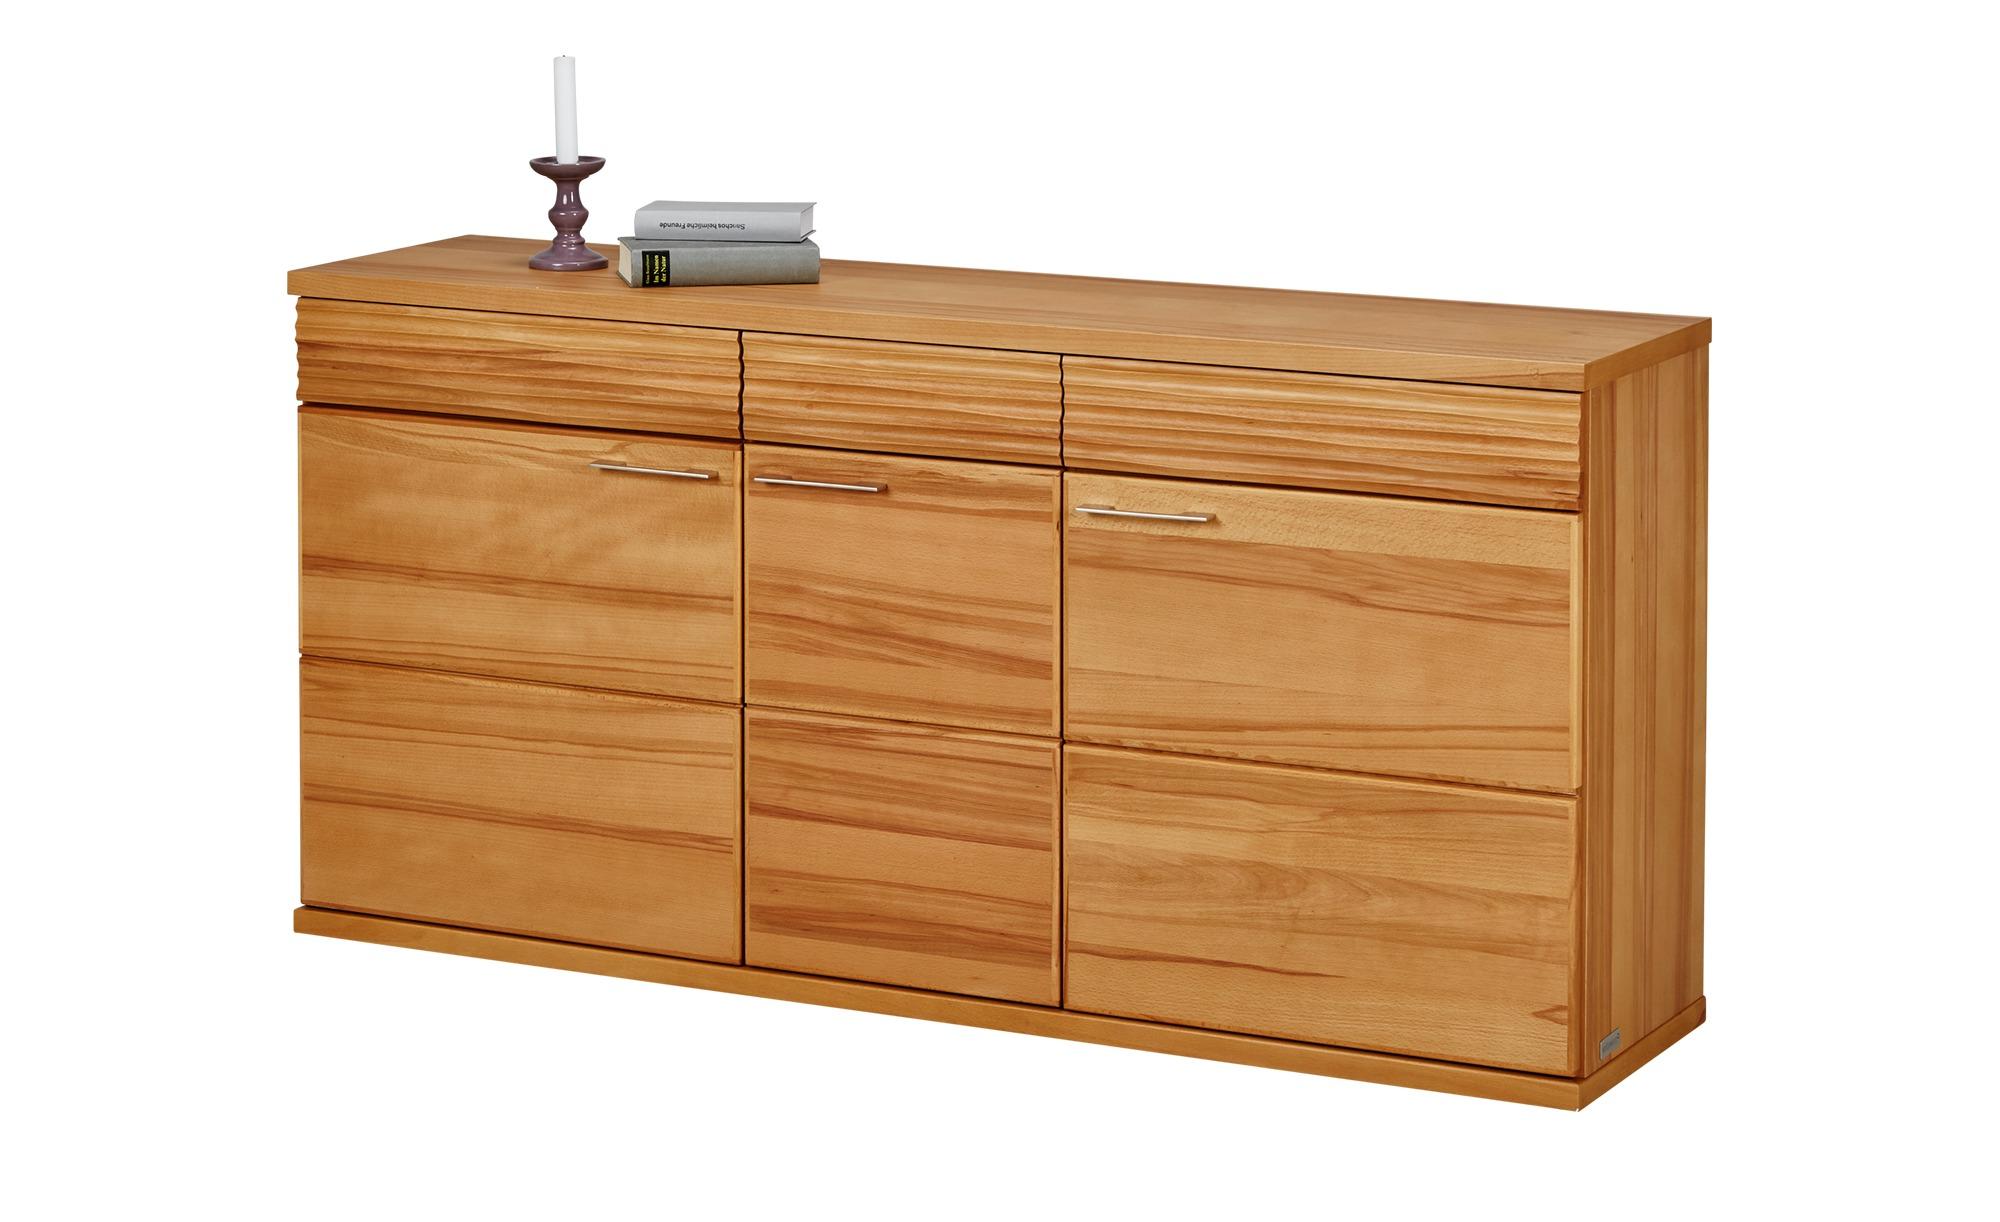 Wohnwert Sideboard  Angus ¦ holzfarben ¦ Maße (cm): B: 162 H: 80 T: 41 Kommoden & Sideboards > Sideboards - Höffner